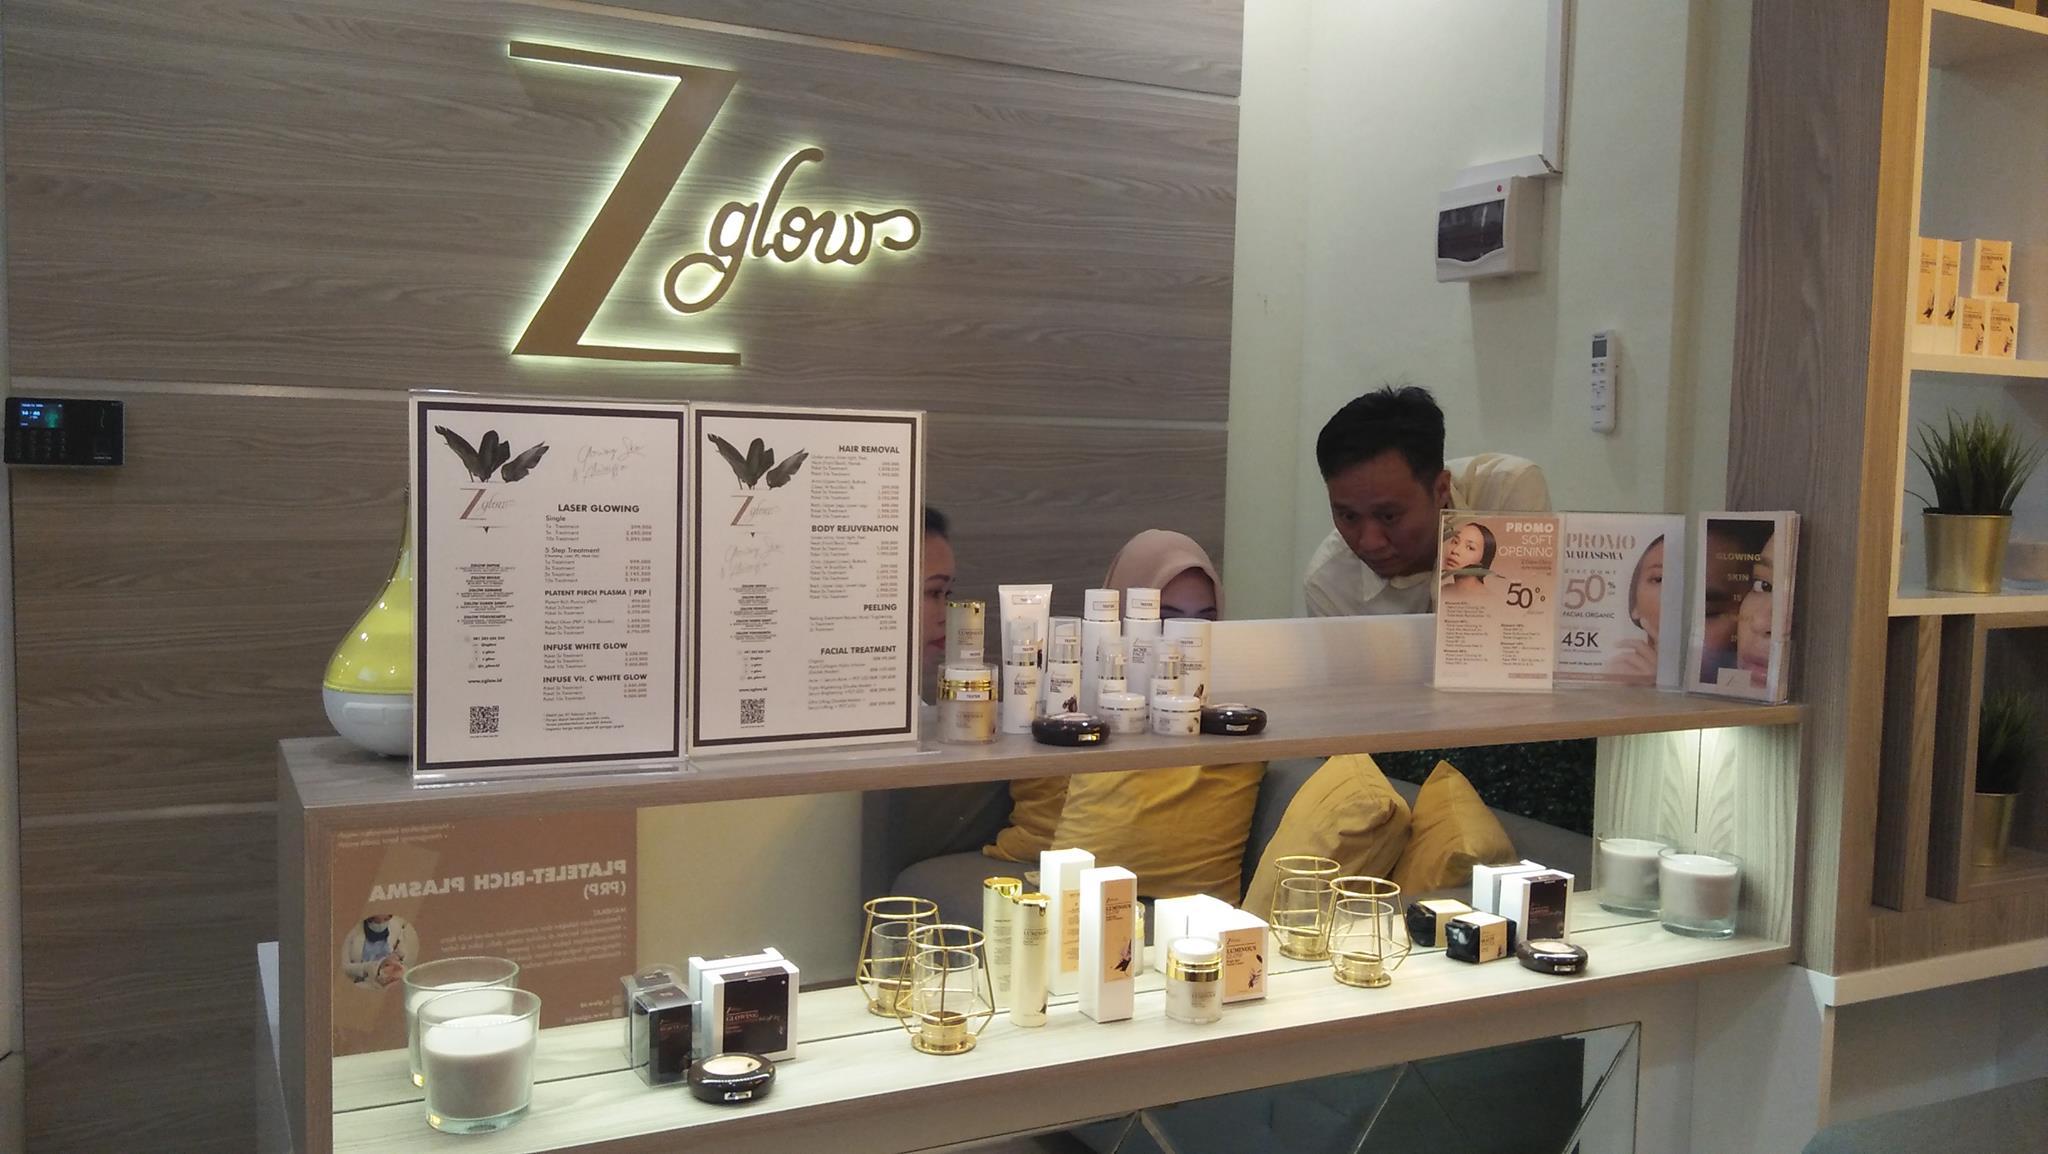 Jogja Medical Center, Zglow Clinic Kekinian Yang Super Nyaman